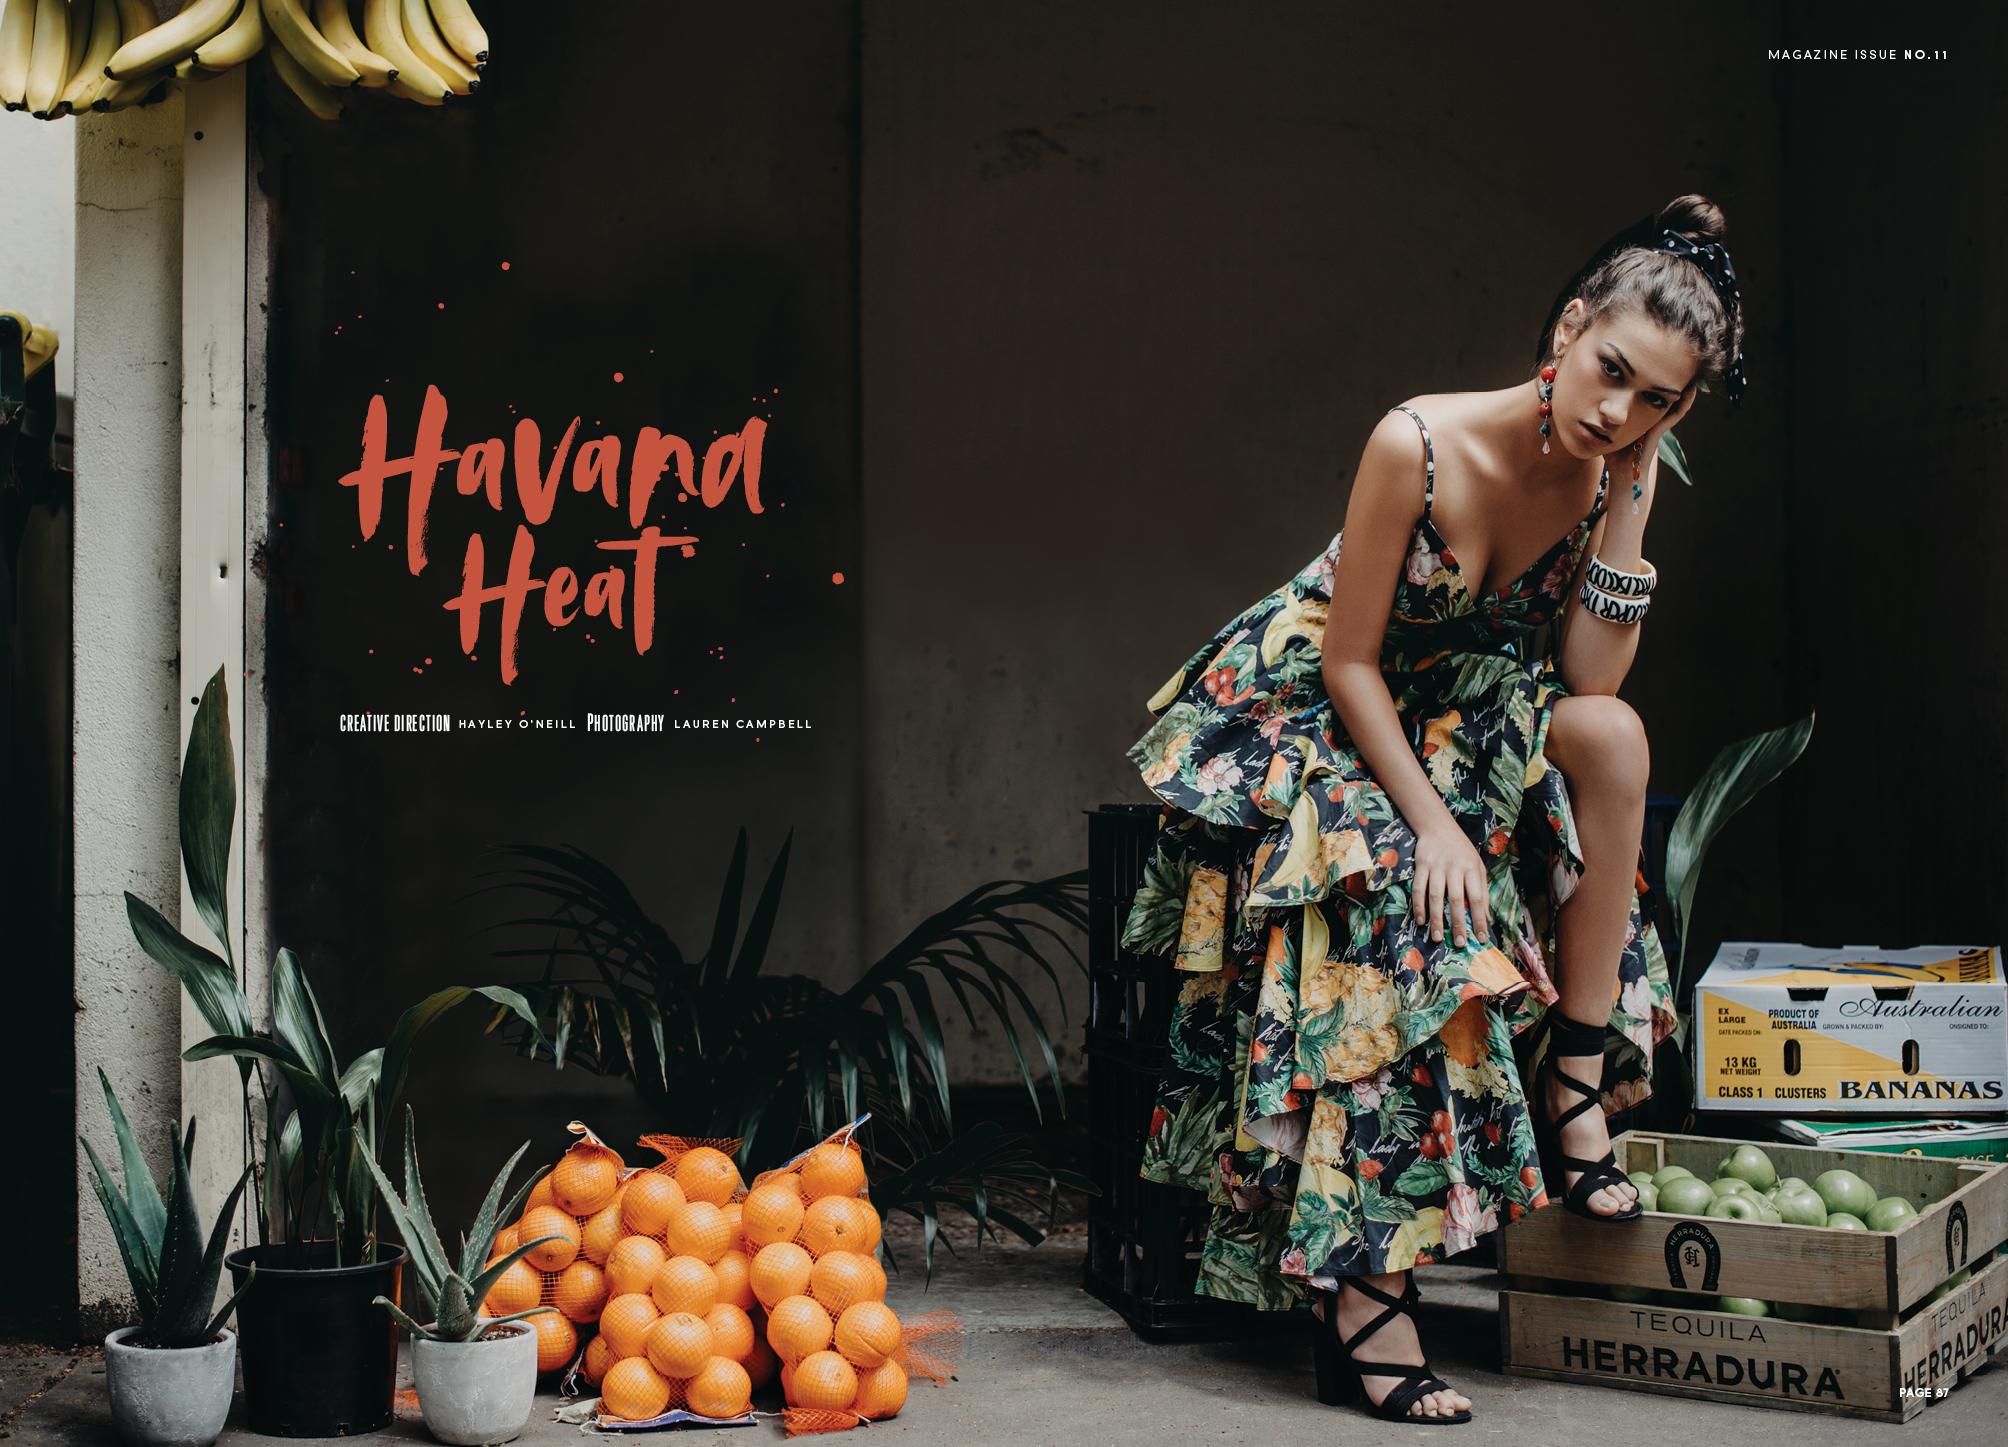 HC_02094_Magazine_Issue_11_Fashion_1.jpg